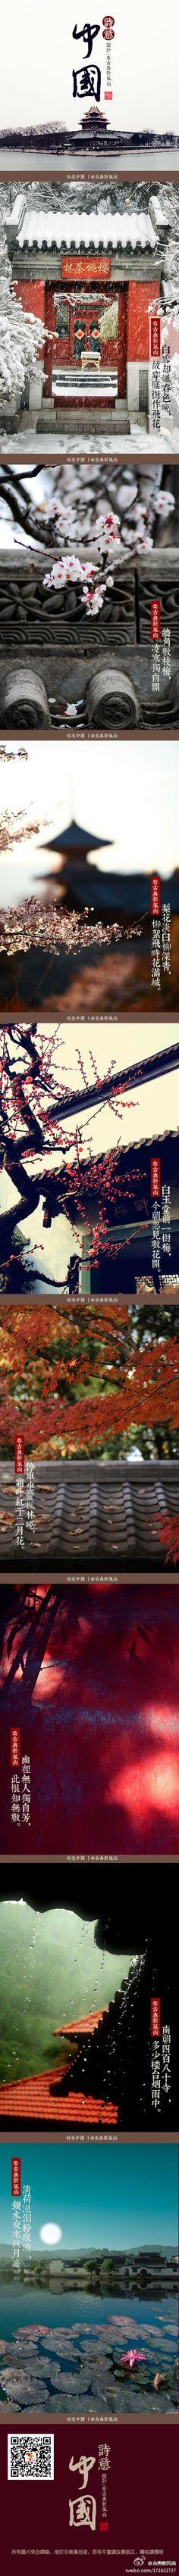 seasons in China